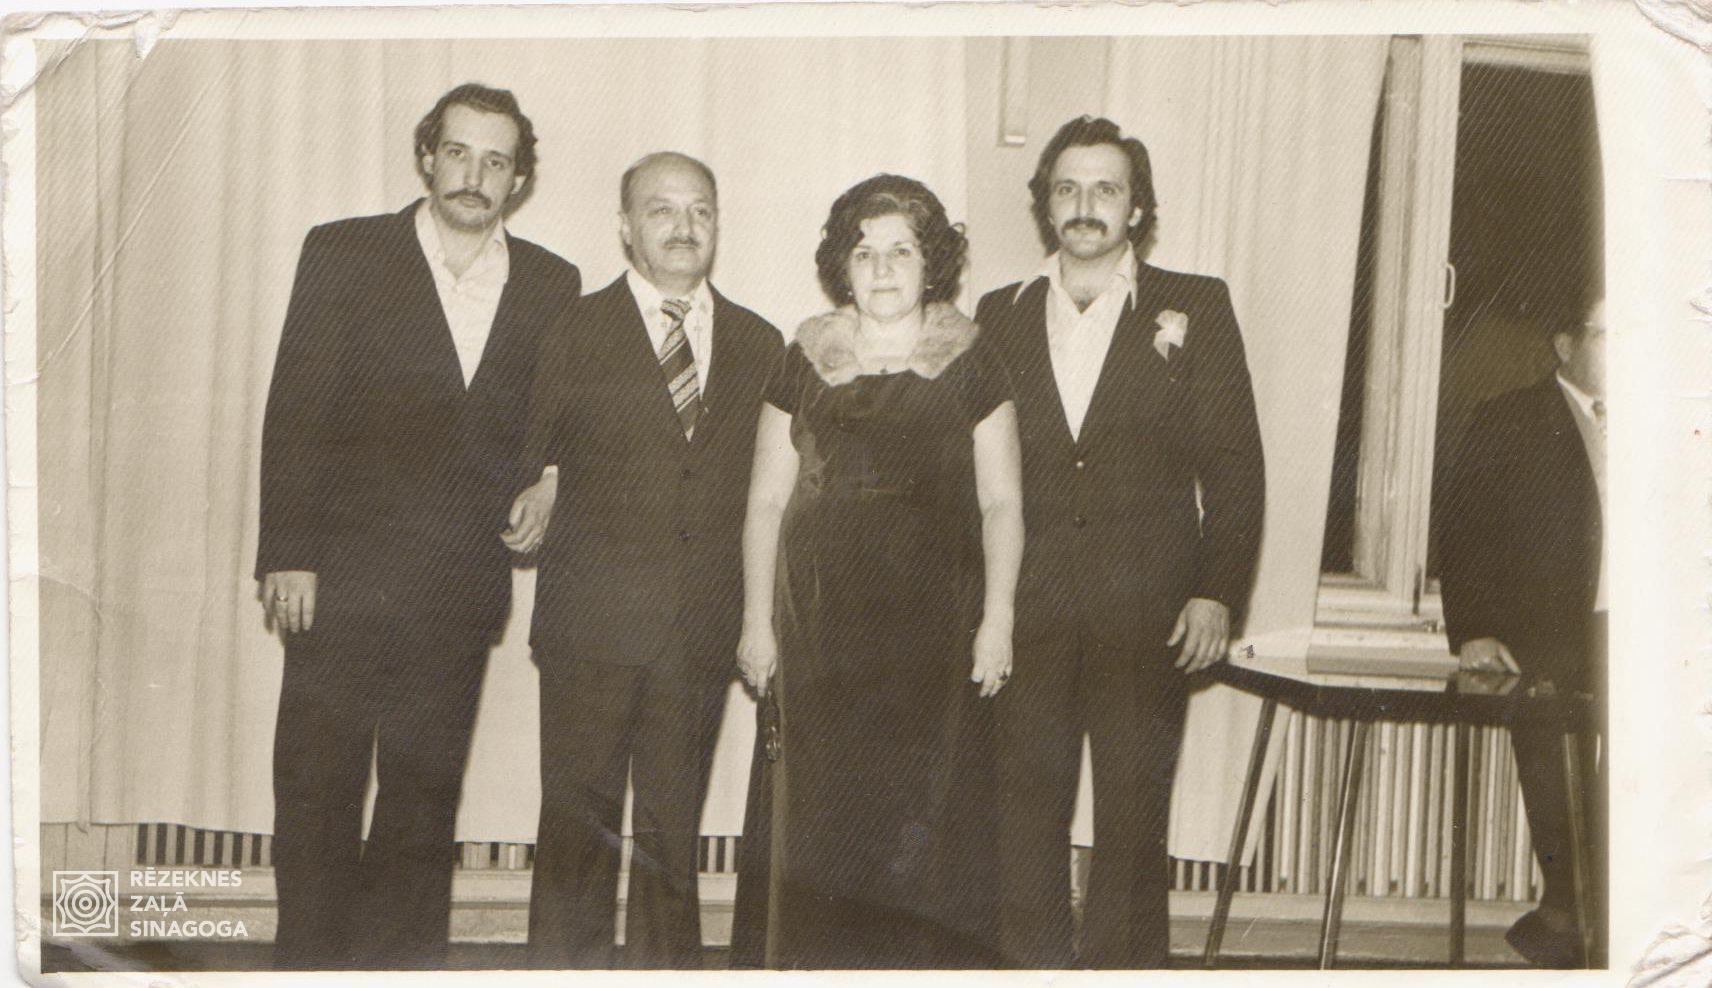 Libermans Izja, Libermans Ļevs, Liberman Sofja, Libermans Iosifs